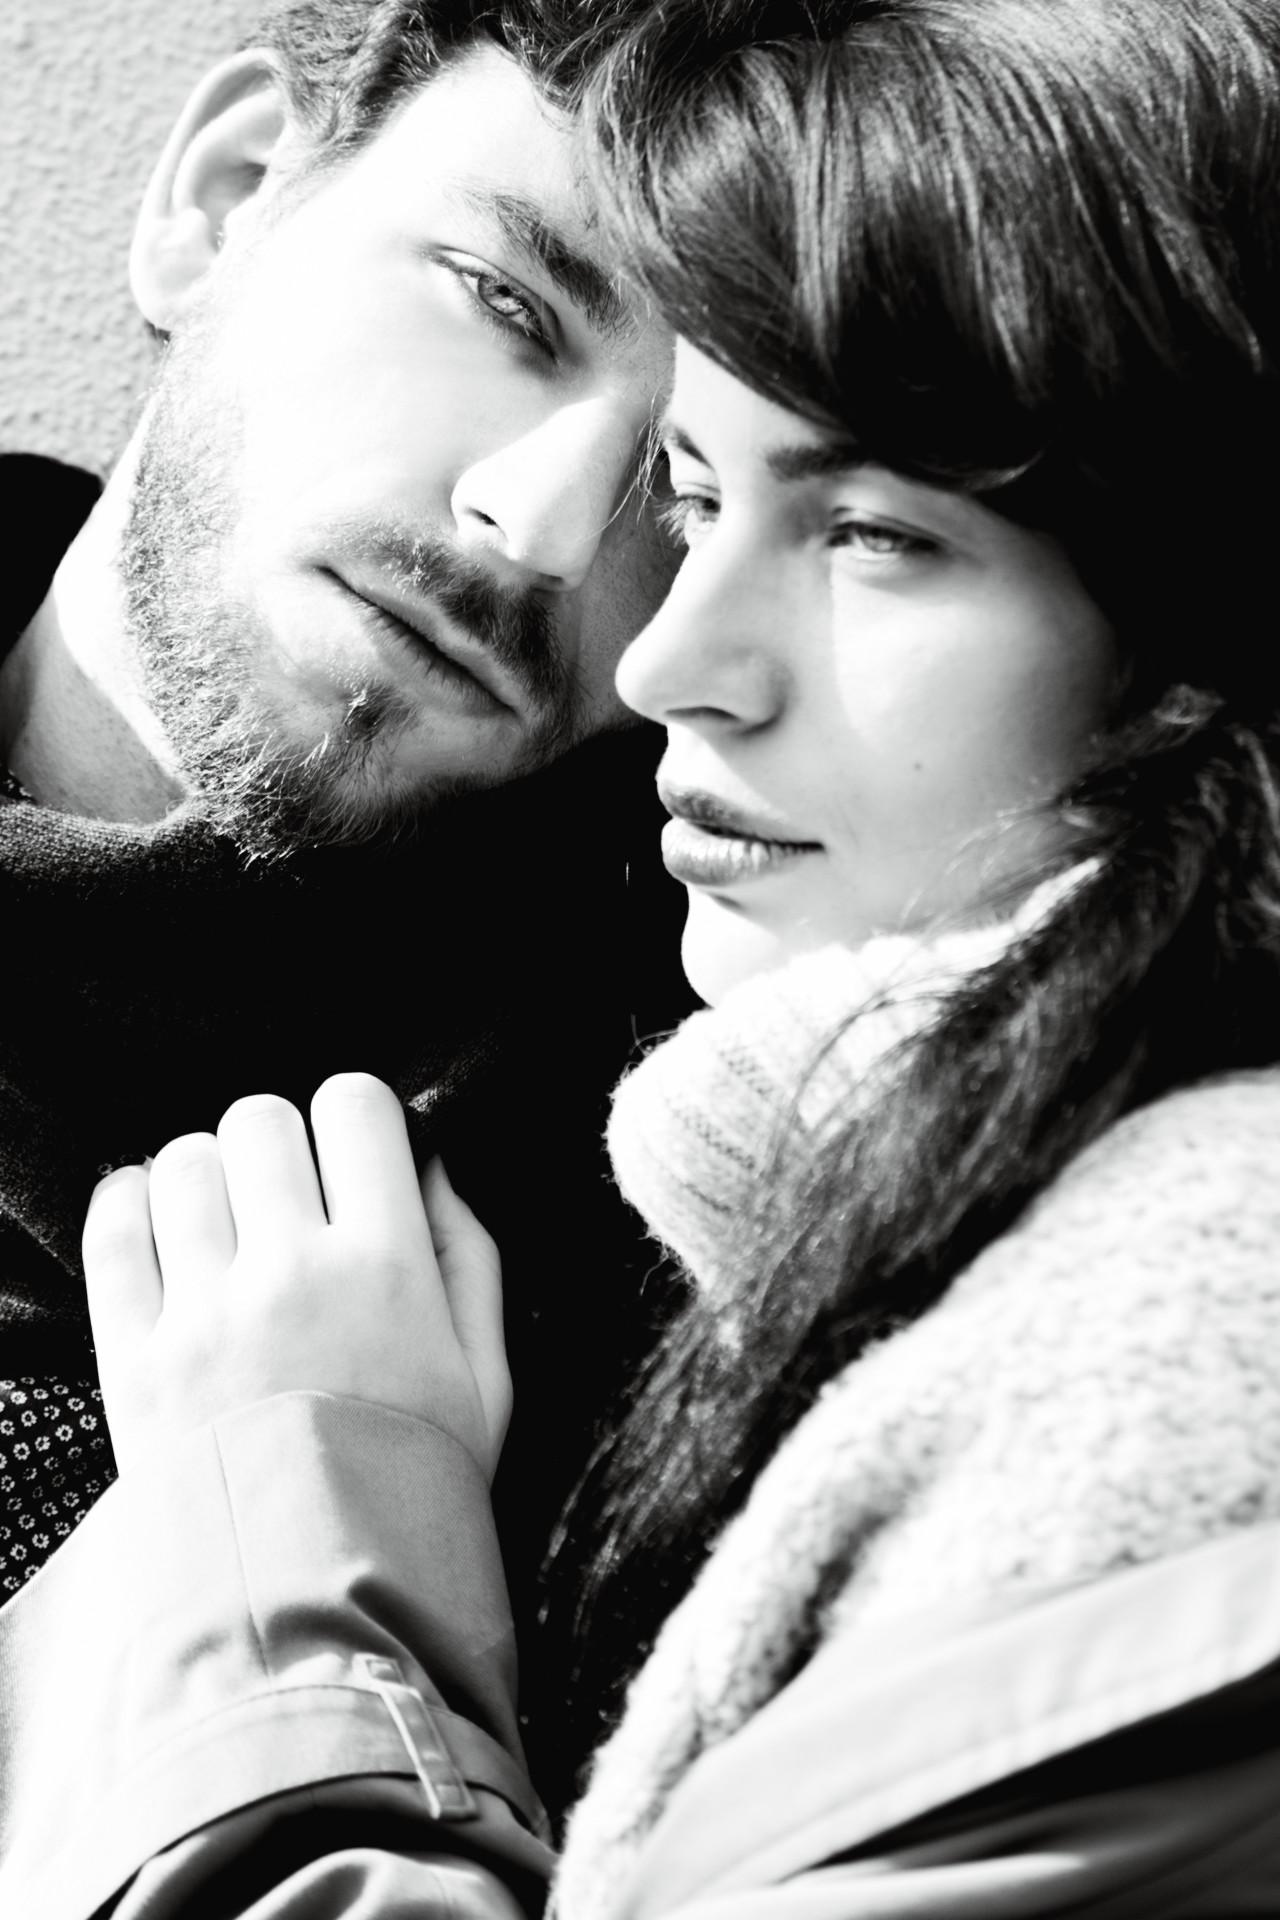 Models: Adi Lozancic, Lisa Tritscher